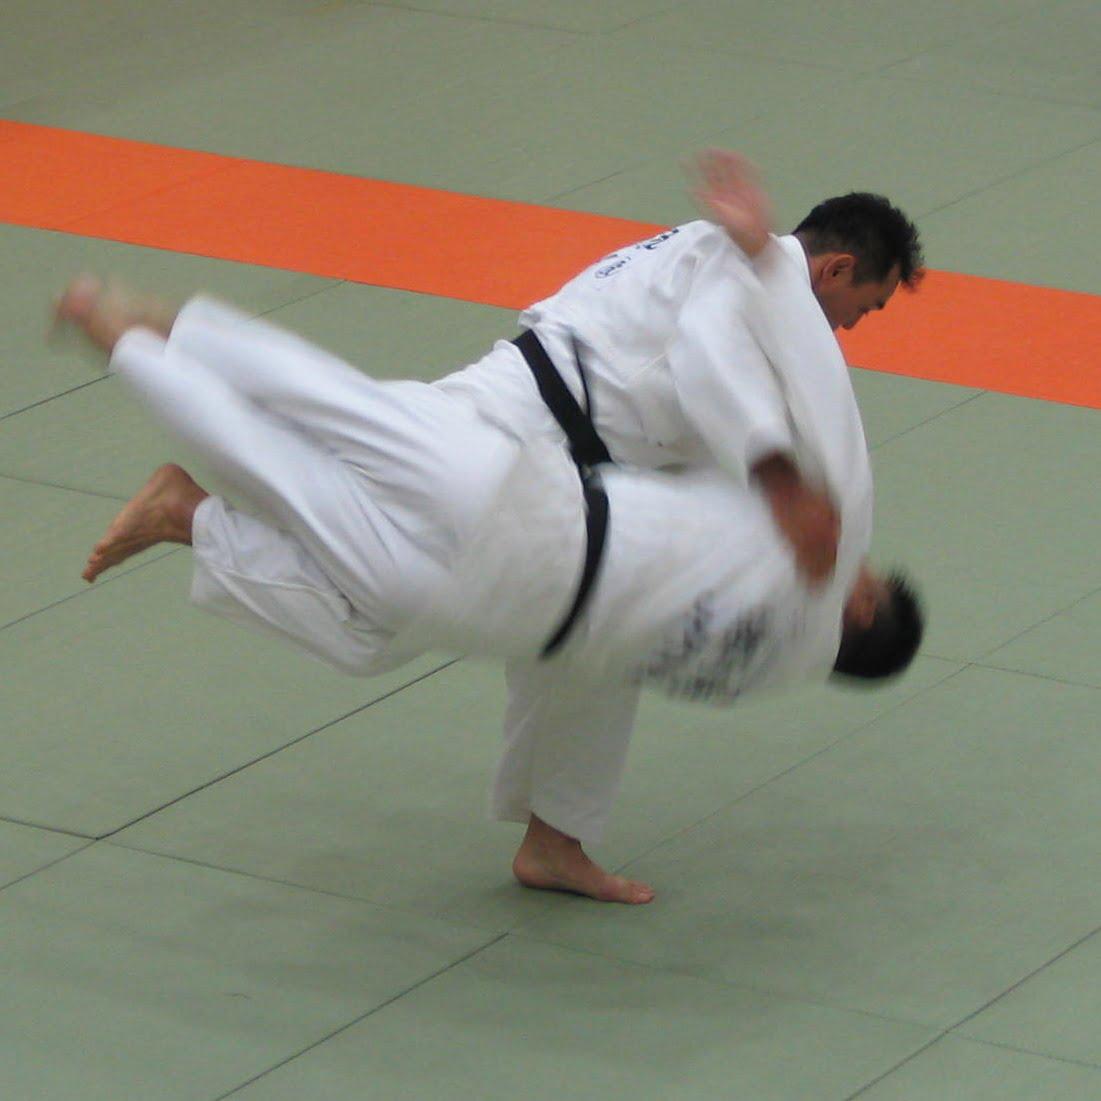 men's judo